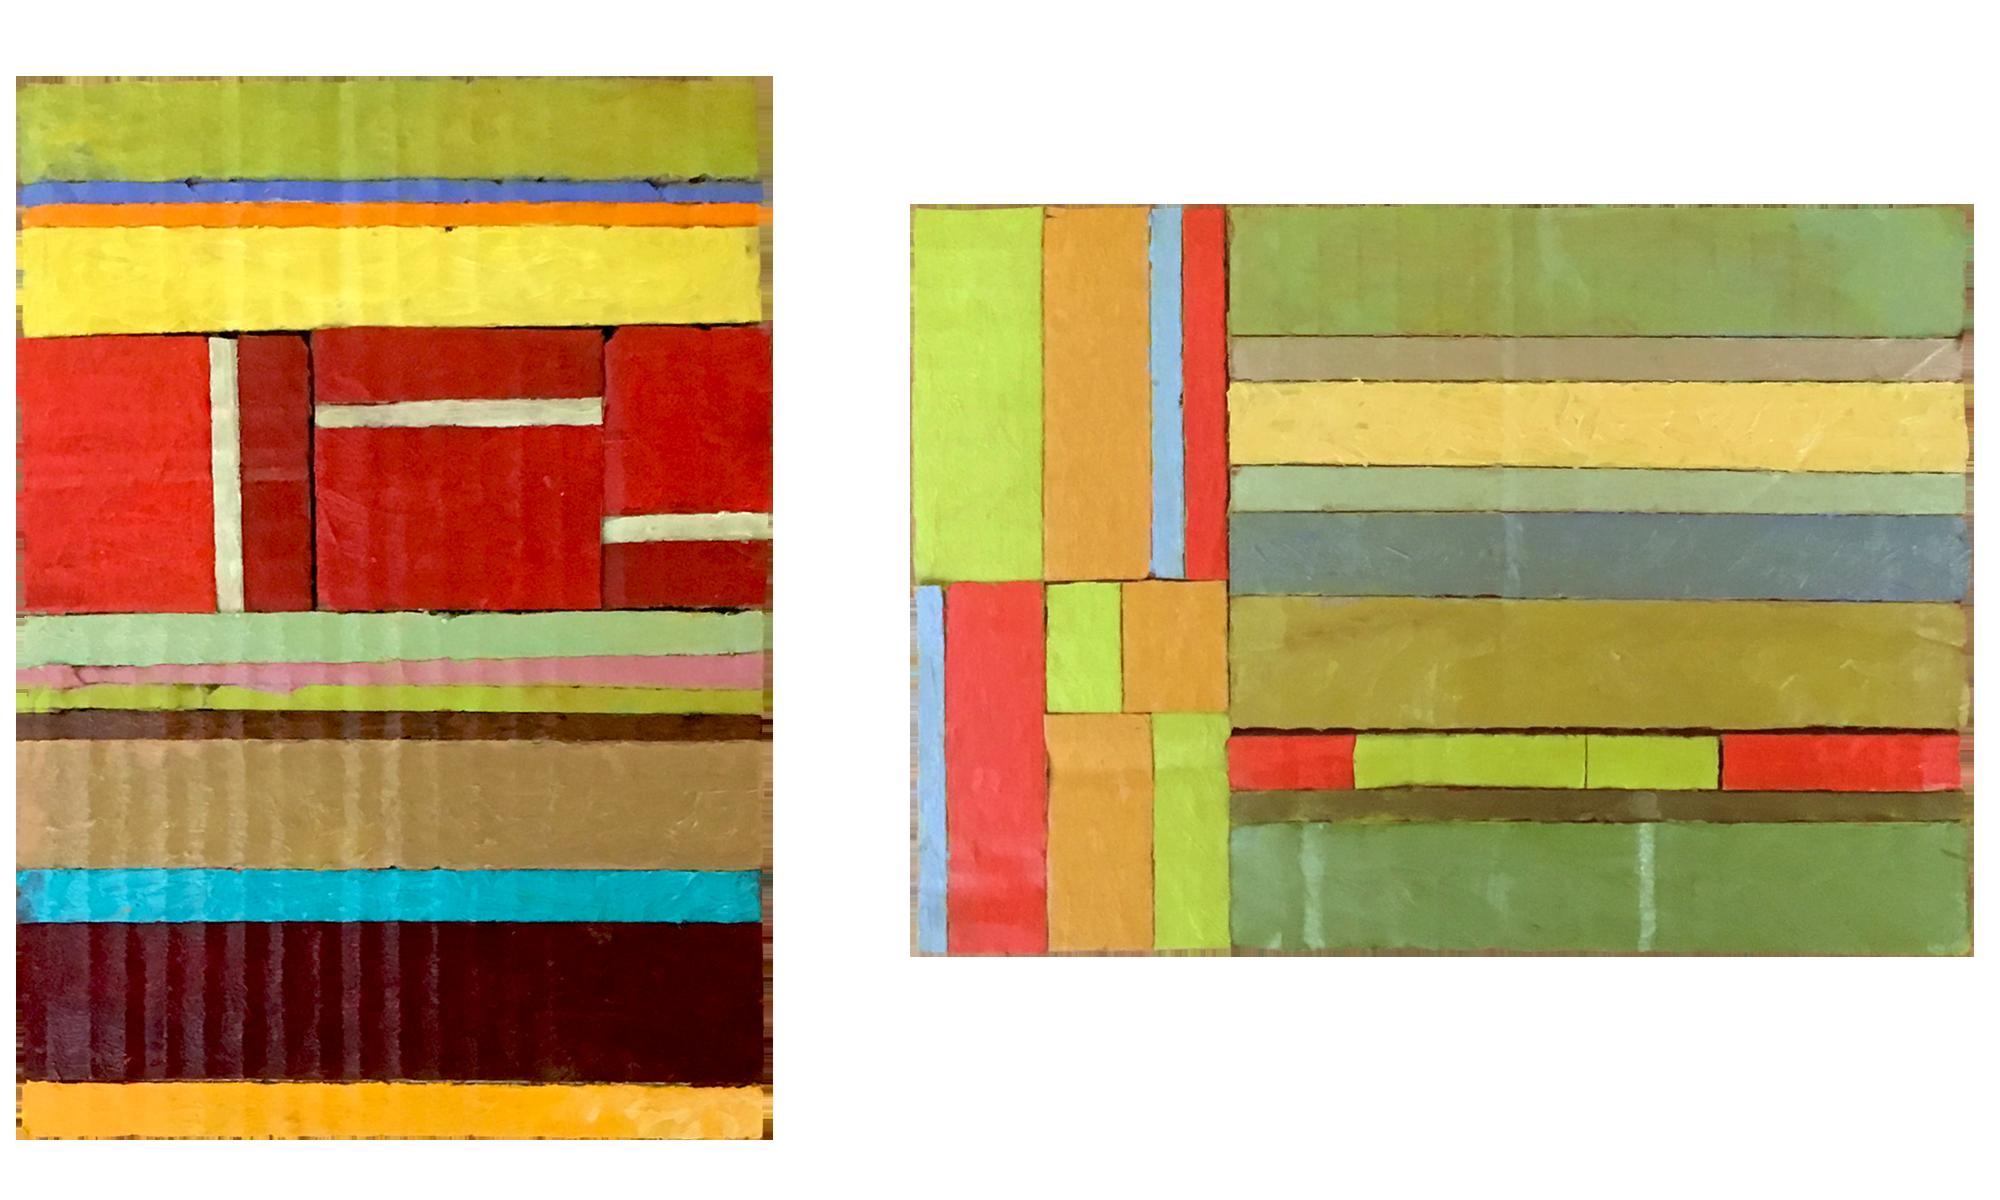 Left: SPICE TRADE, right: DECKEL HIER LOSEN, both 2018, oil on cardboard, 148cm x 210cm.